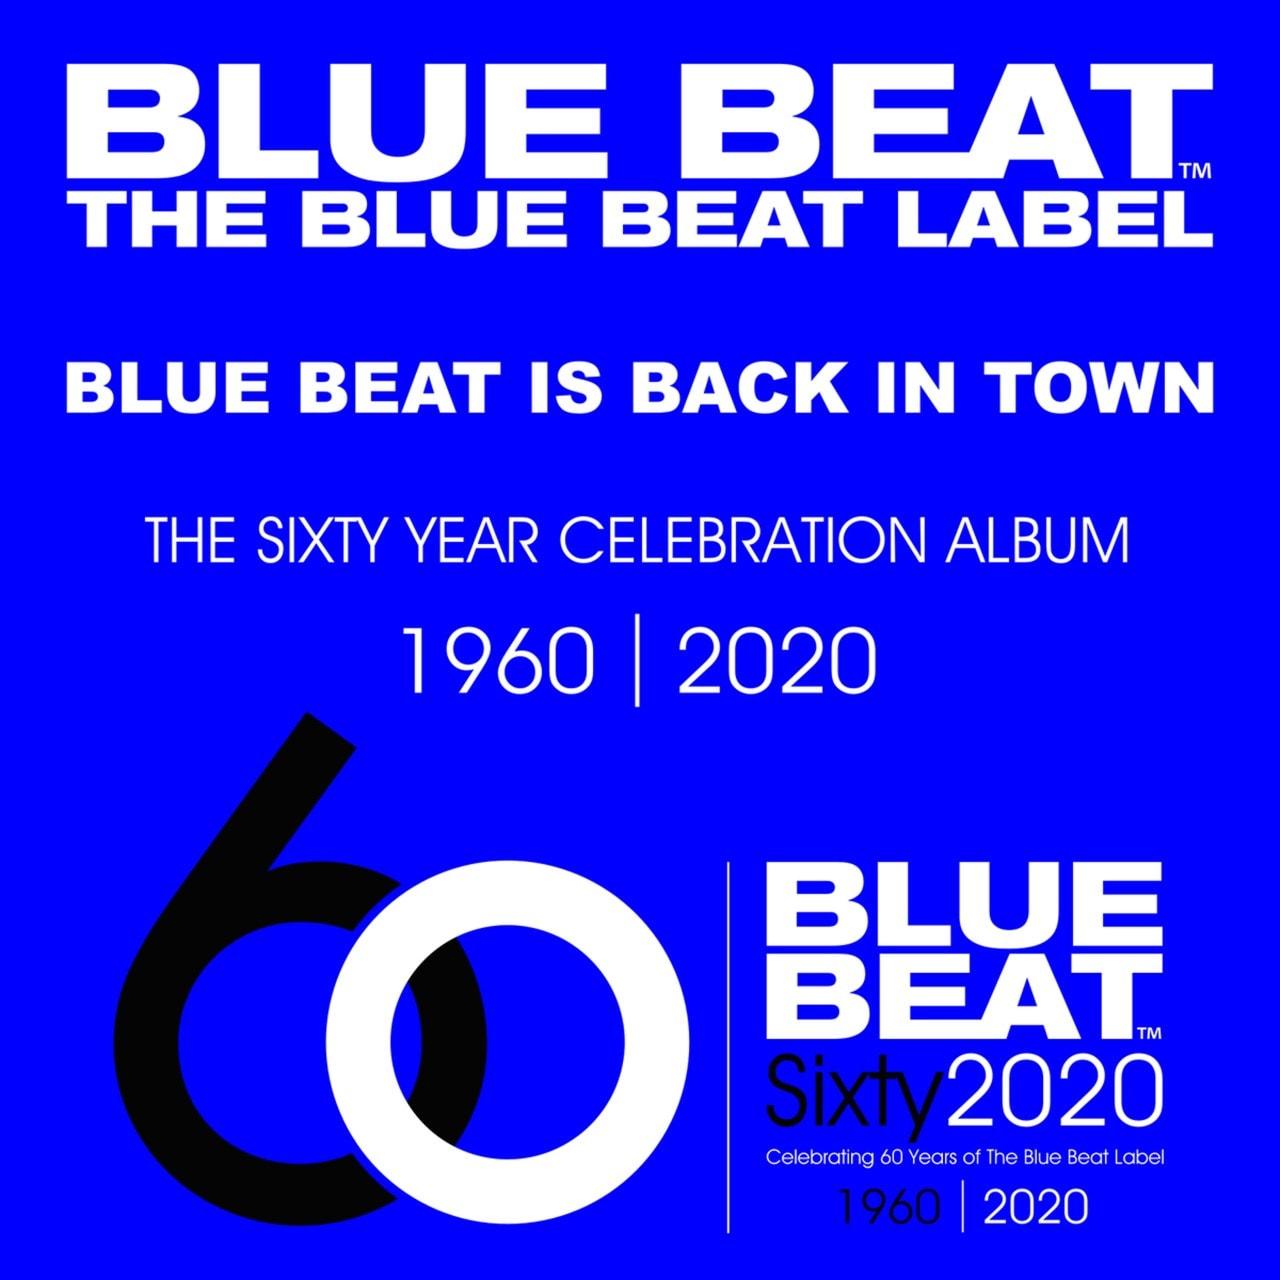 Blue Beat: The Sixty Year Celebration Album 1960-2020 - 1